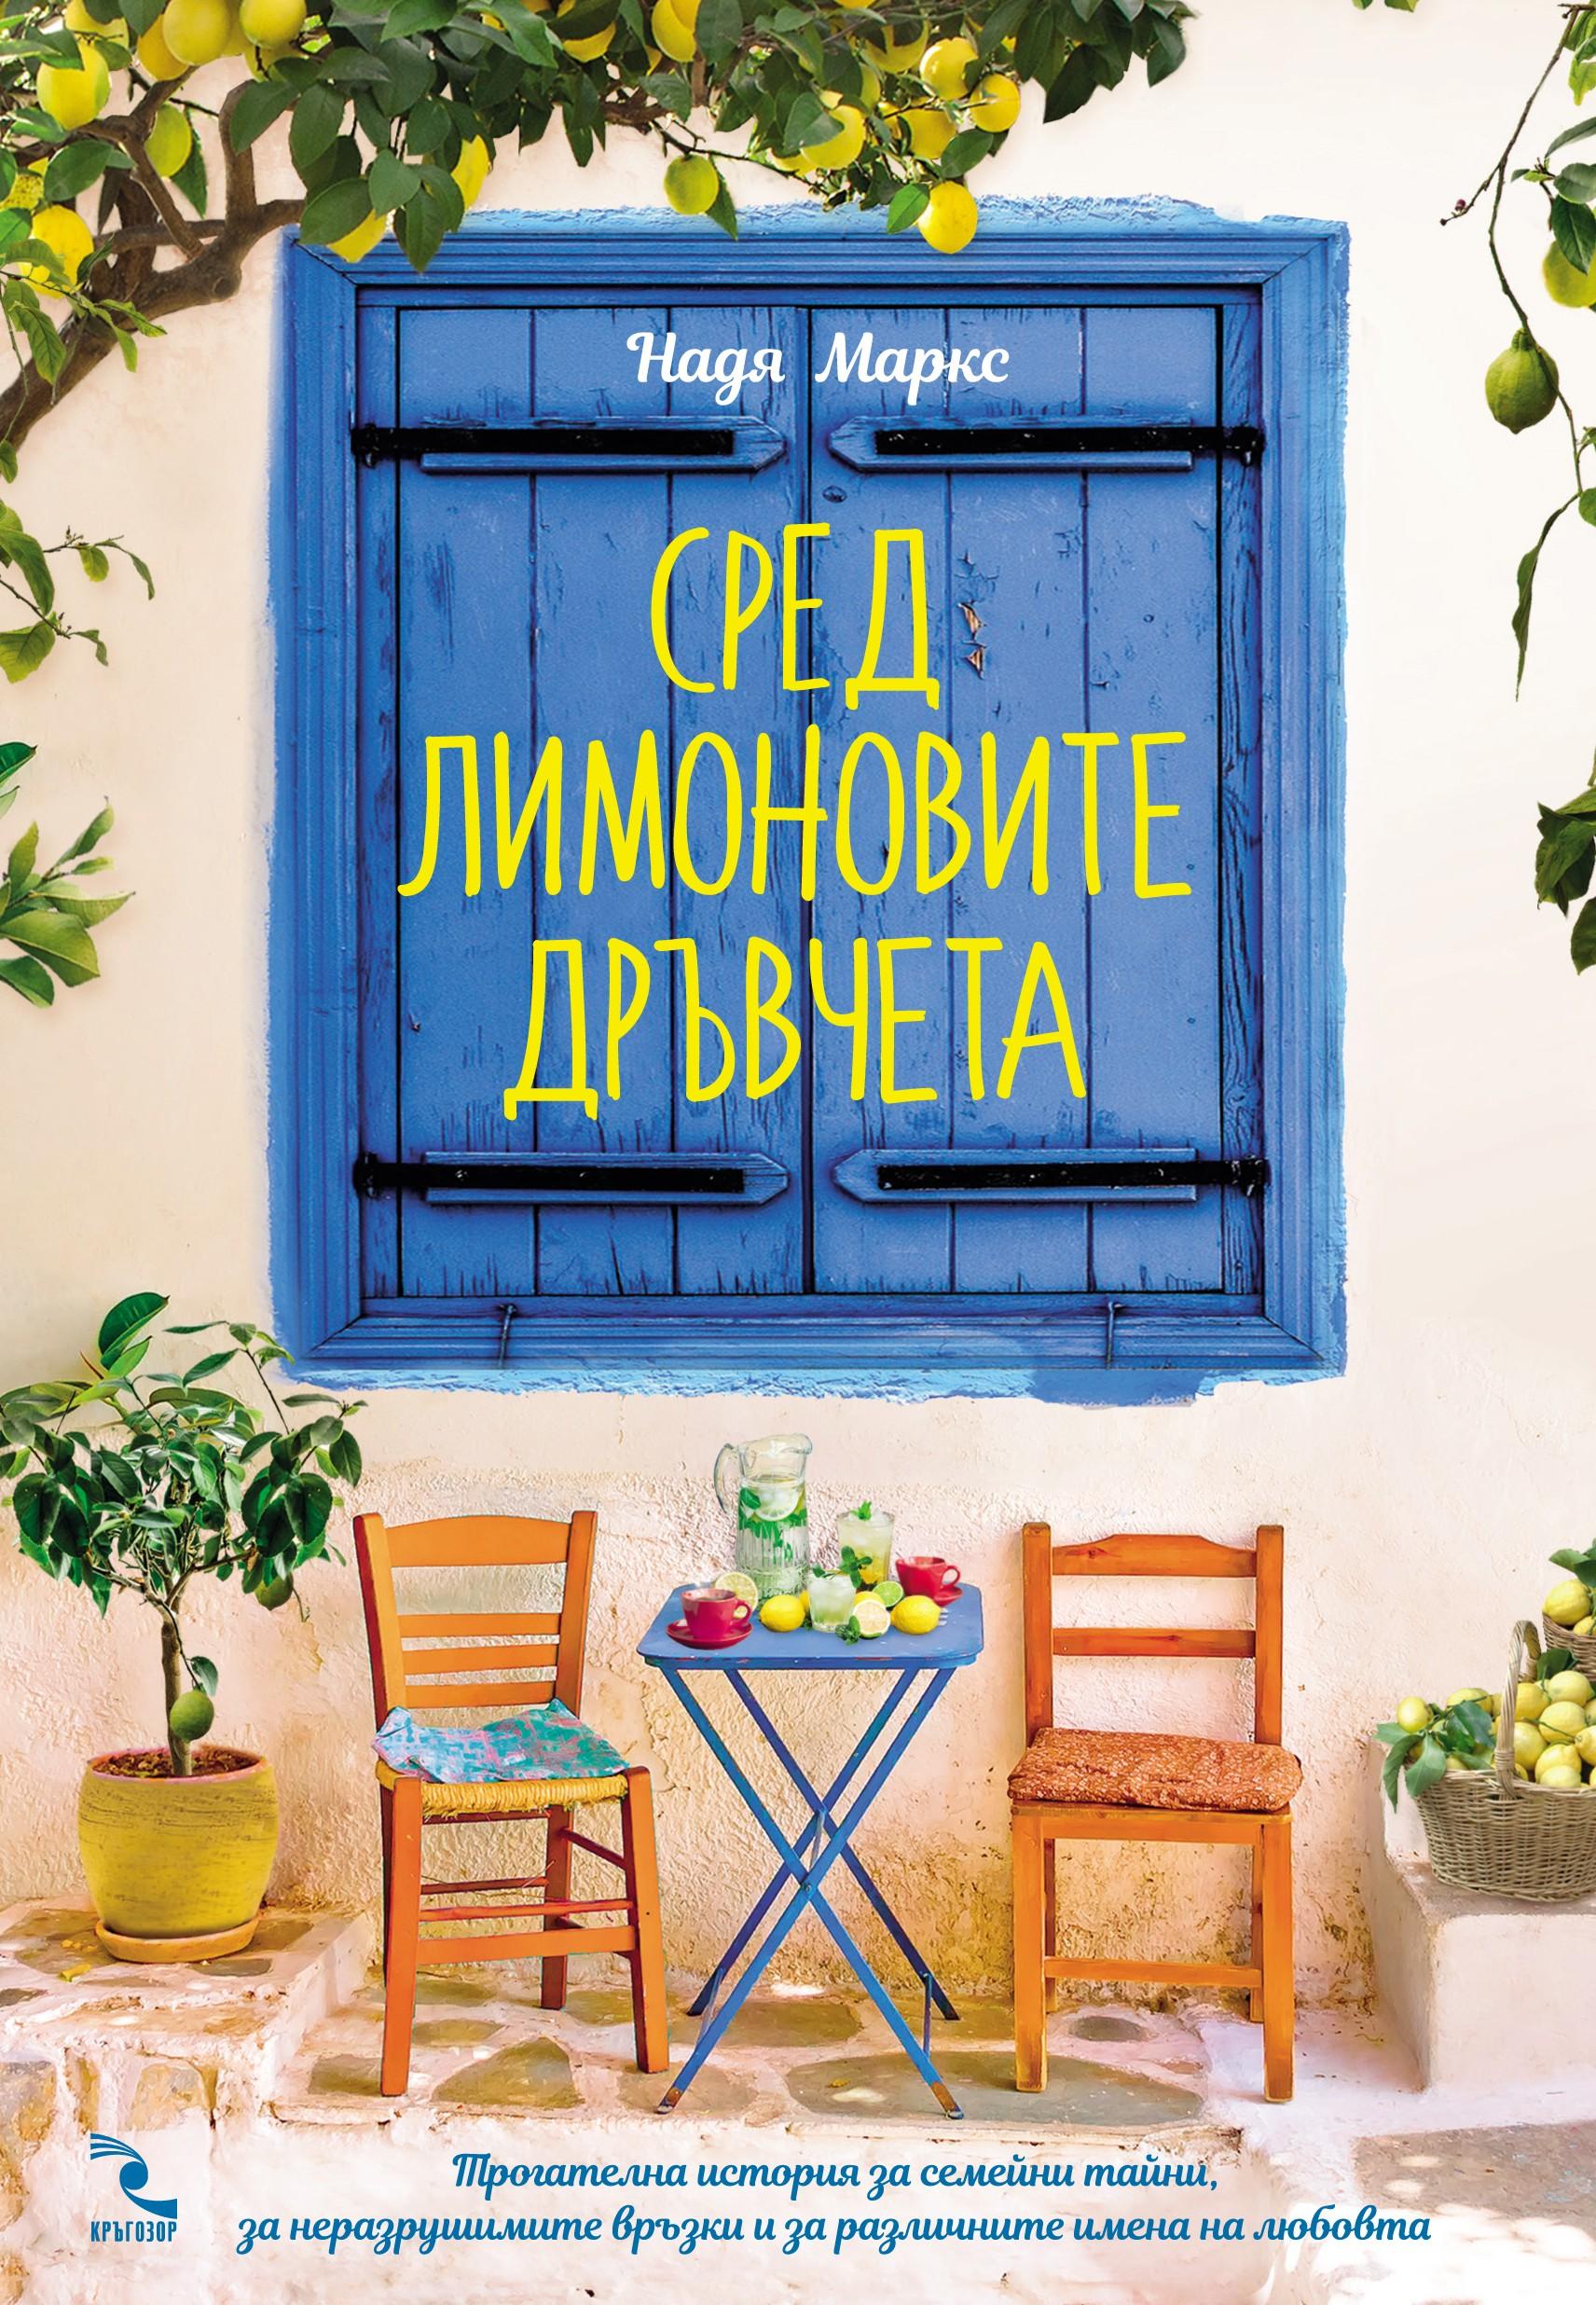 sred-limonovite-dryvcheta